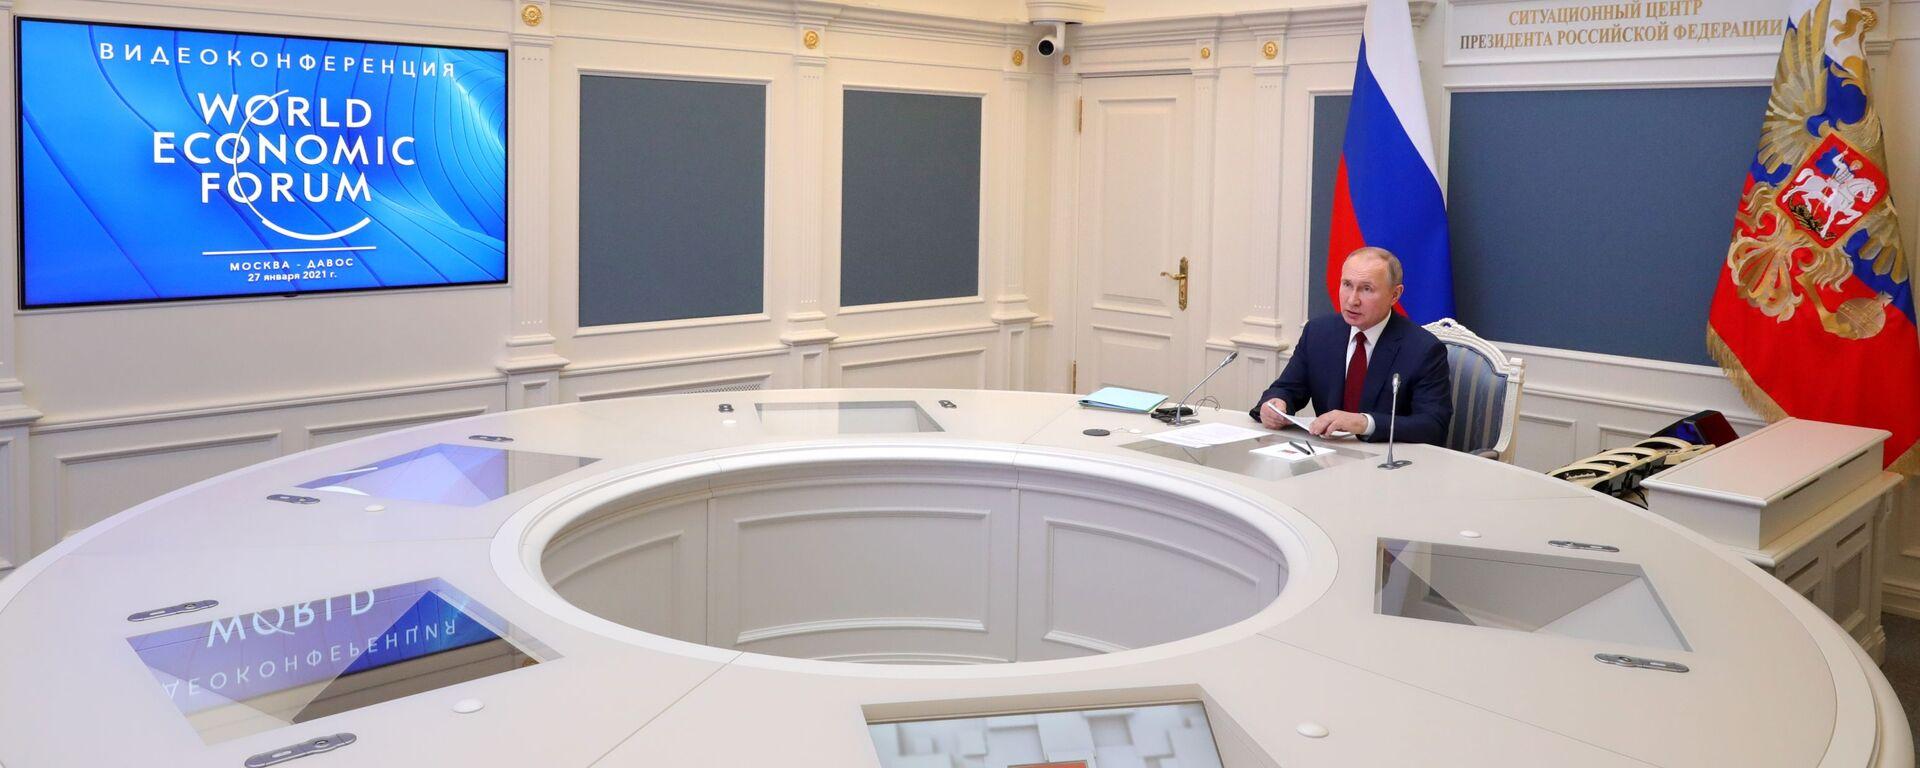 Президент РФ В. Путин выступил на сессии онлайн-форума Давосская повестка дня 2021 - Sputnik Узбекистан, 1920, 28.01.2021